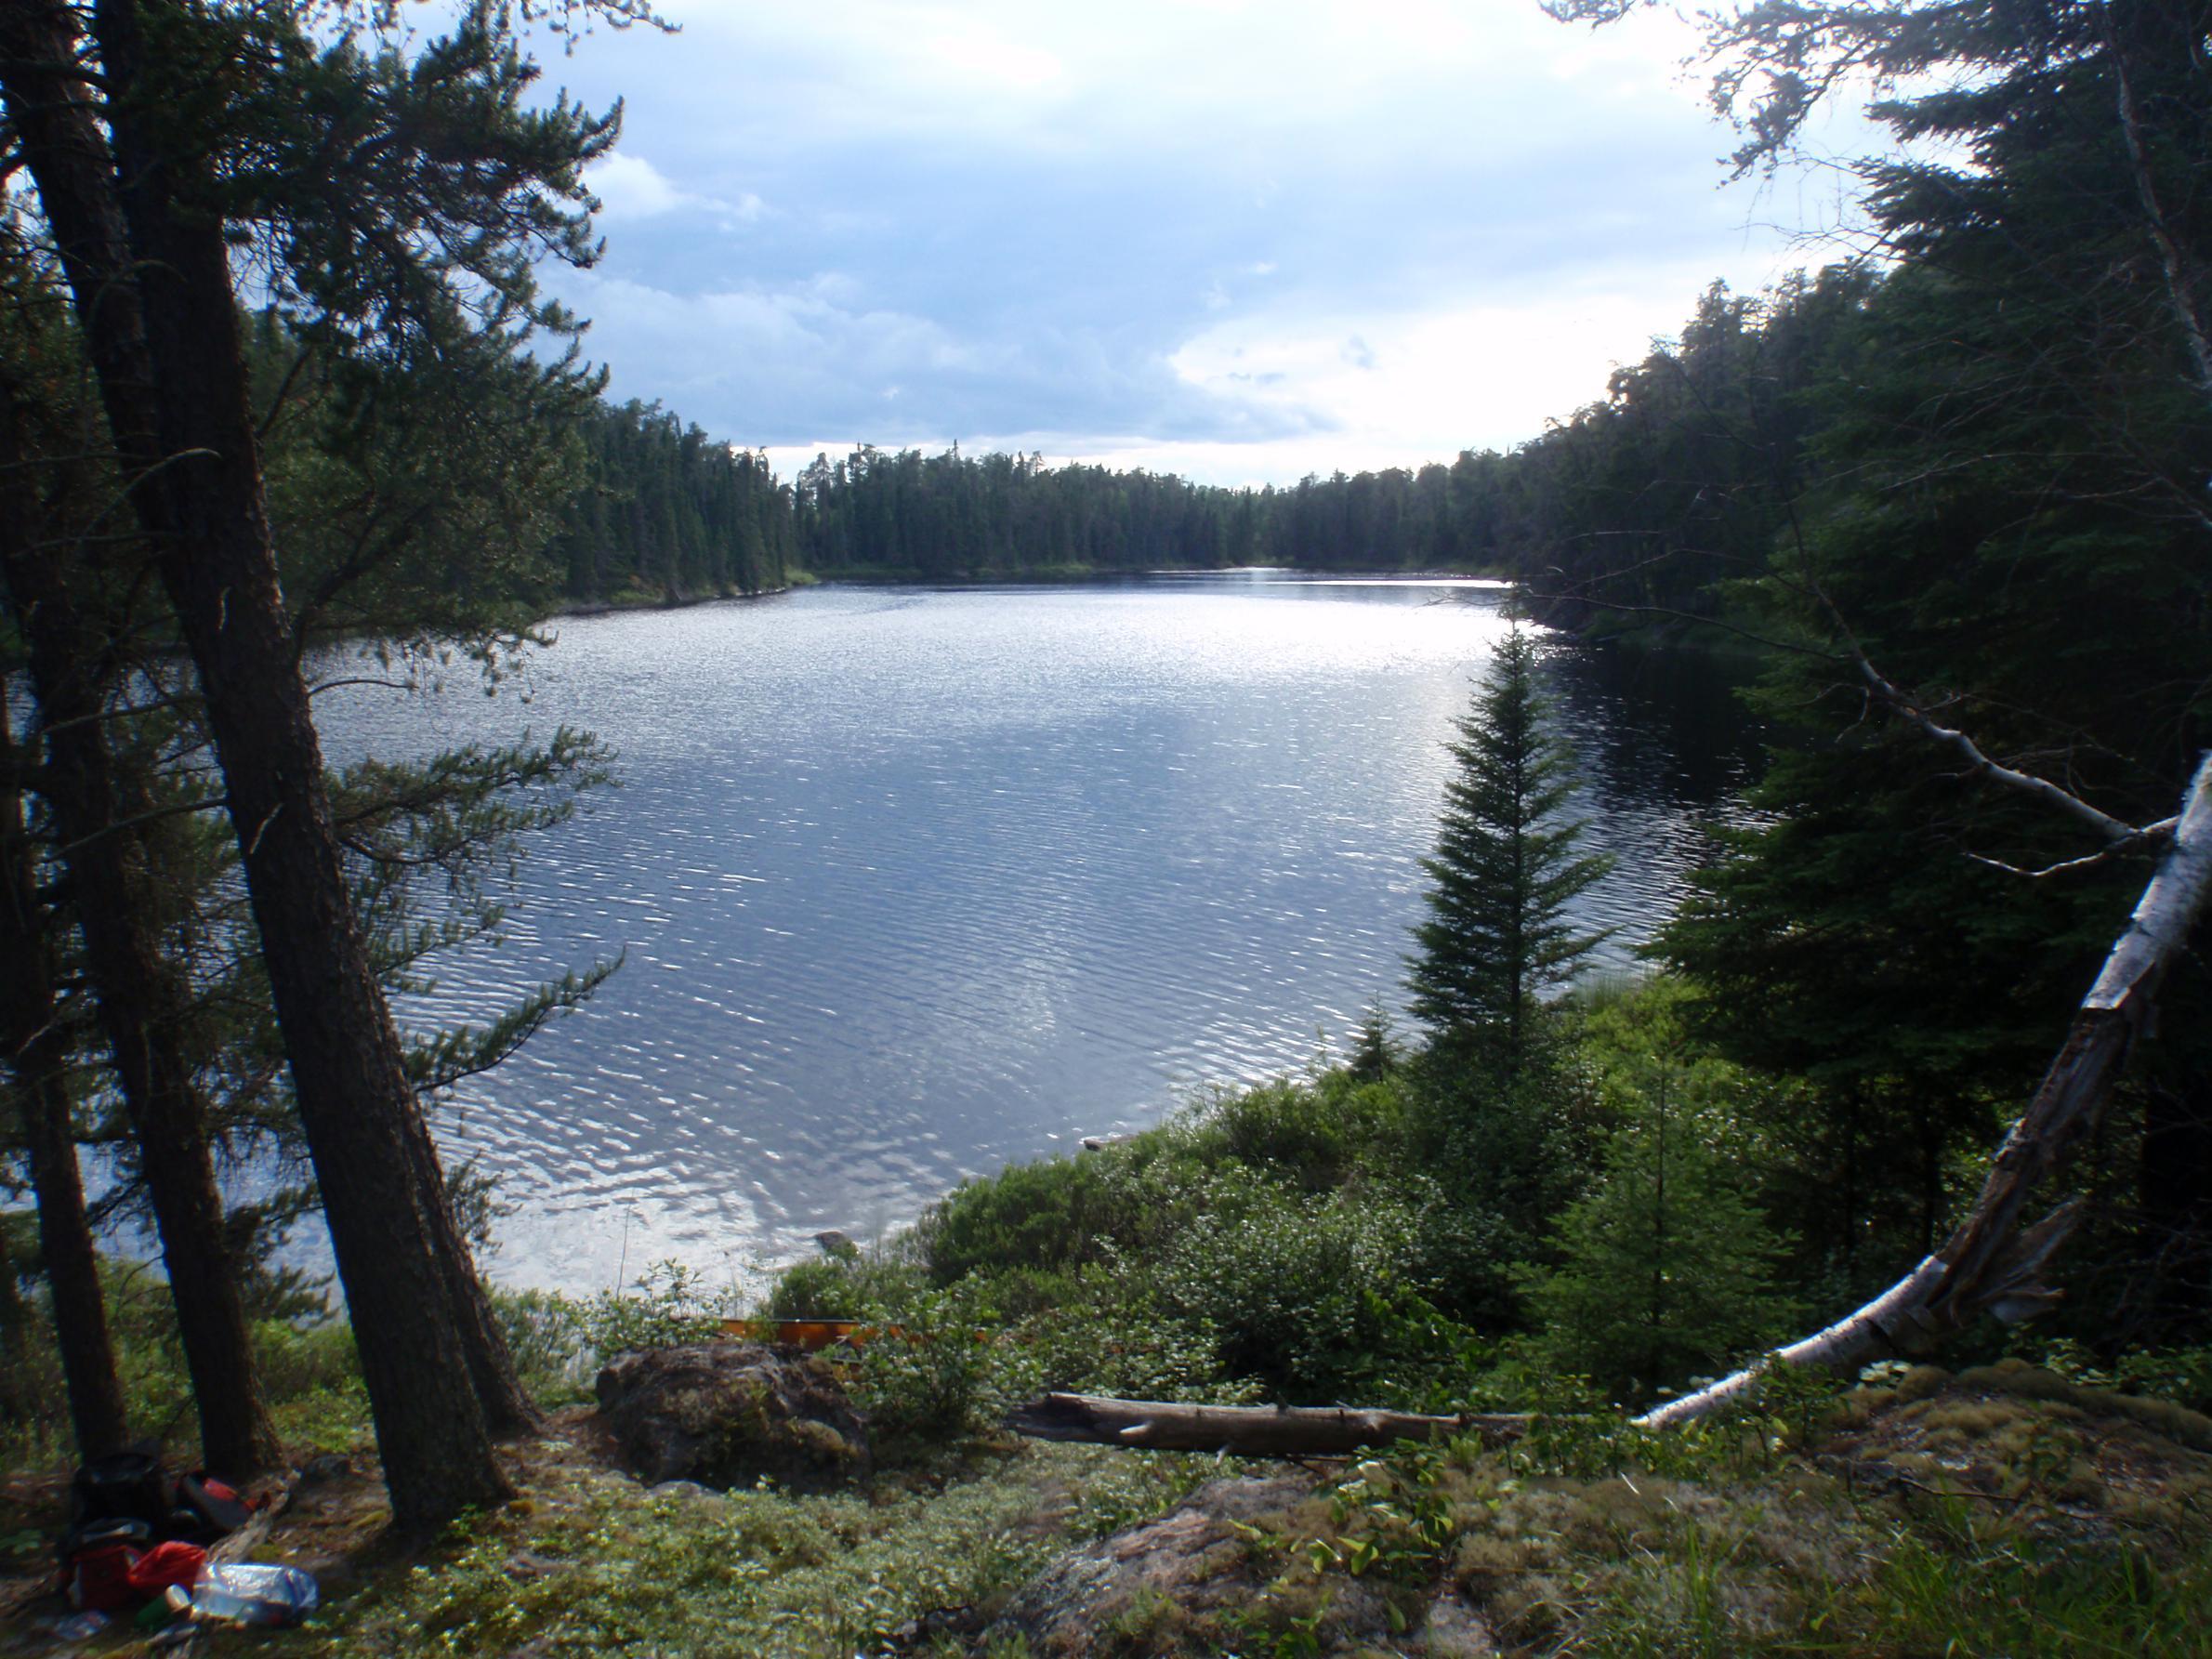 West Hjalmar Lake 2